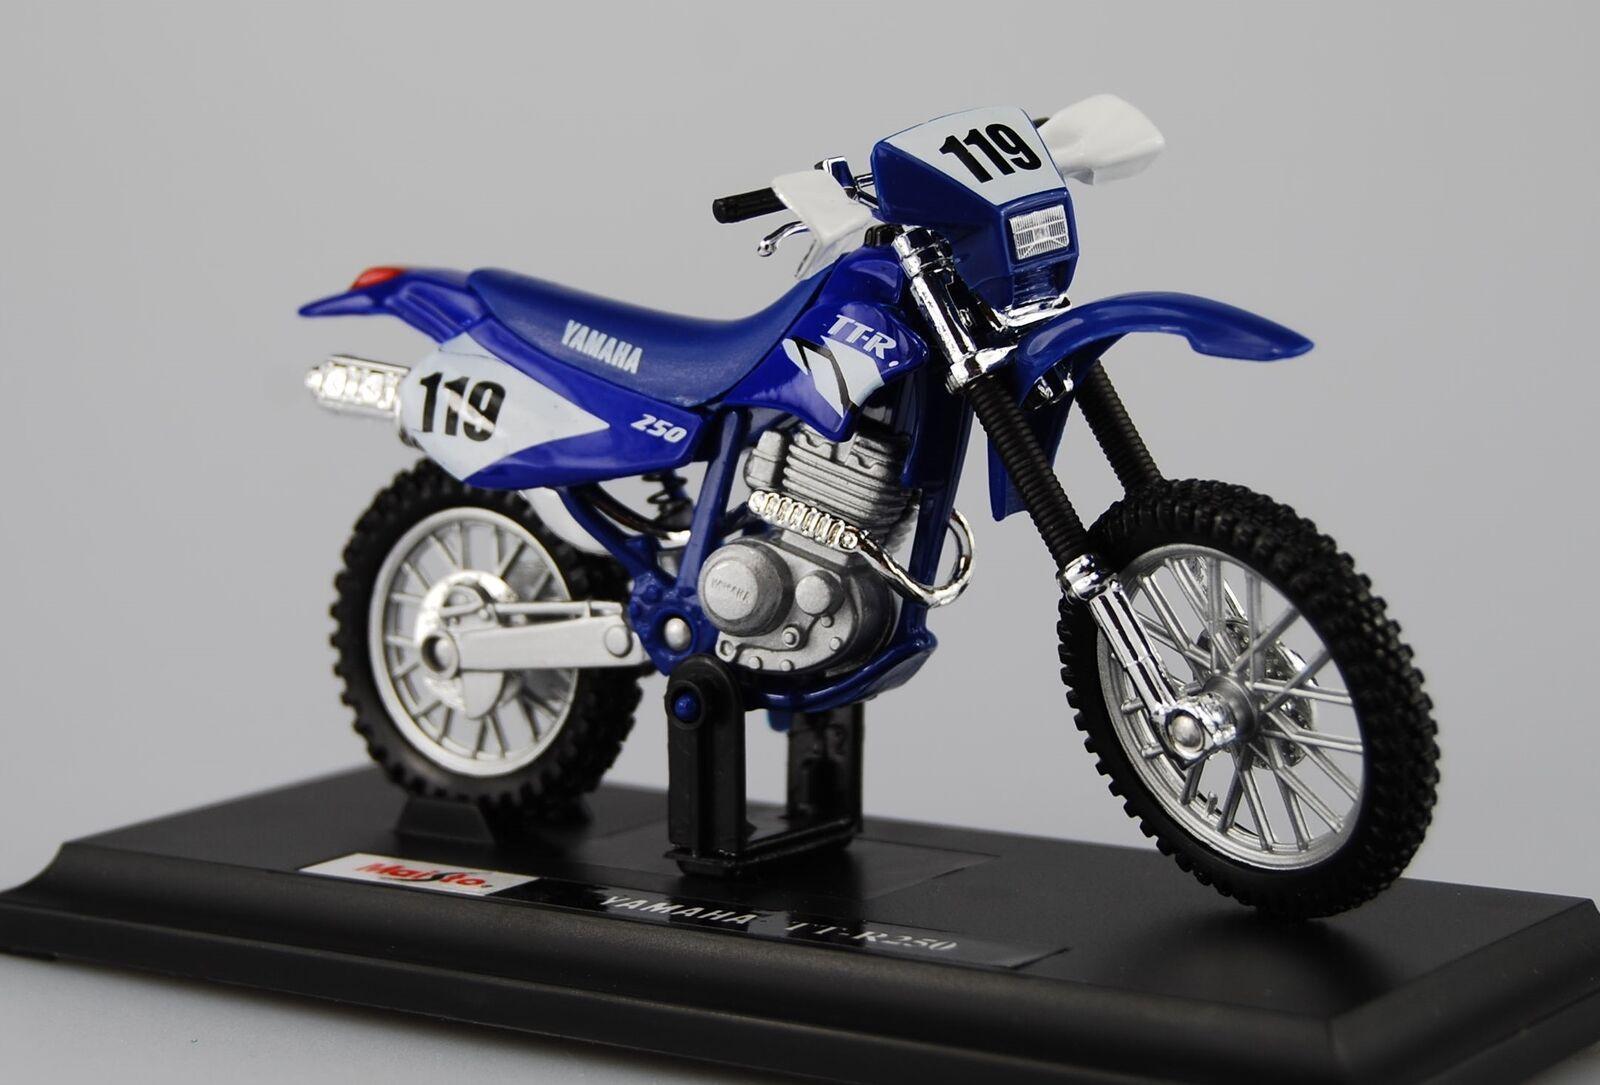 Maisto motorka na stojánku - Yamaha TT-R250 1:18 modrá Miasto